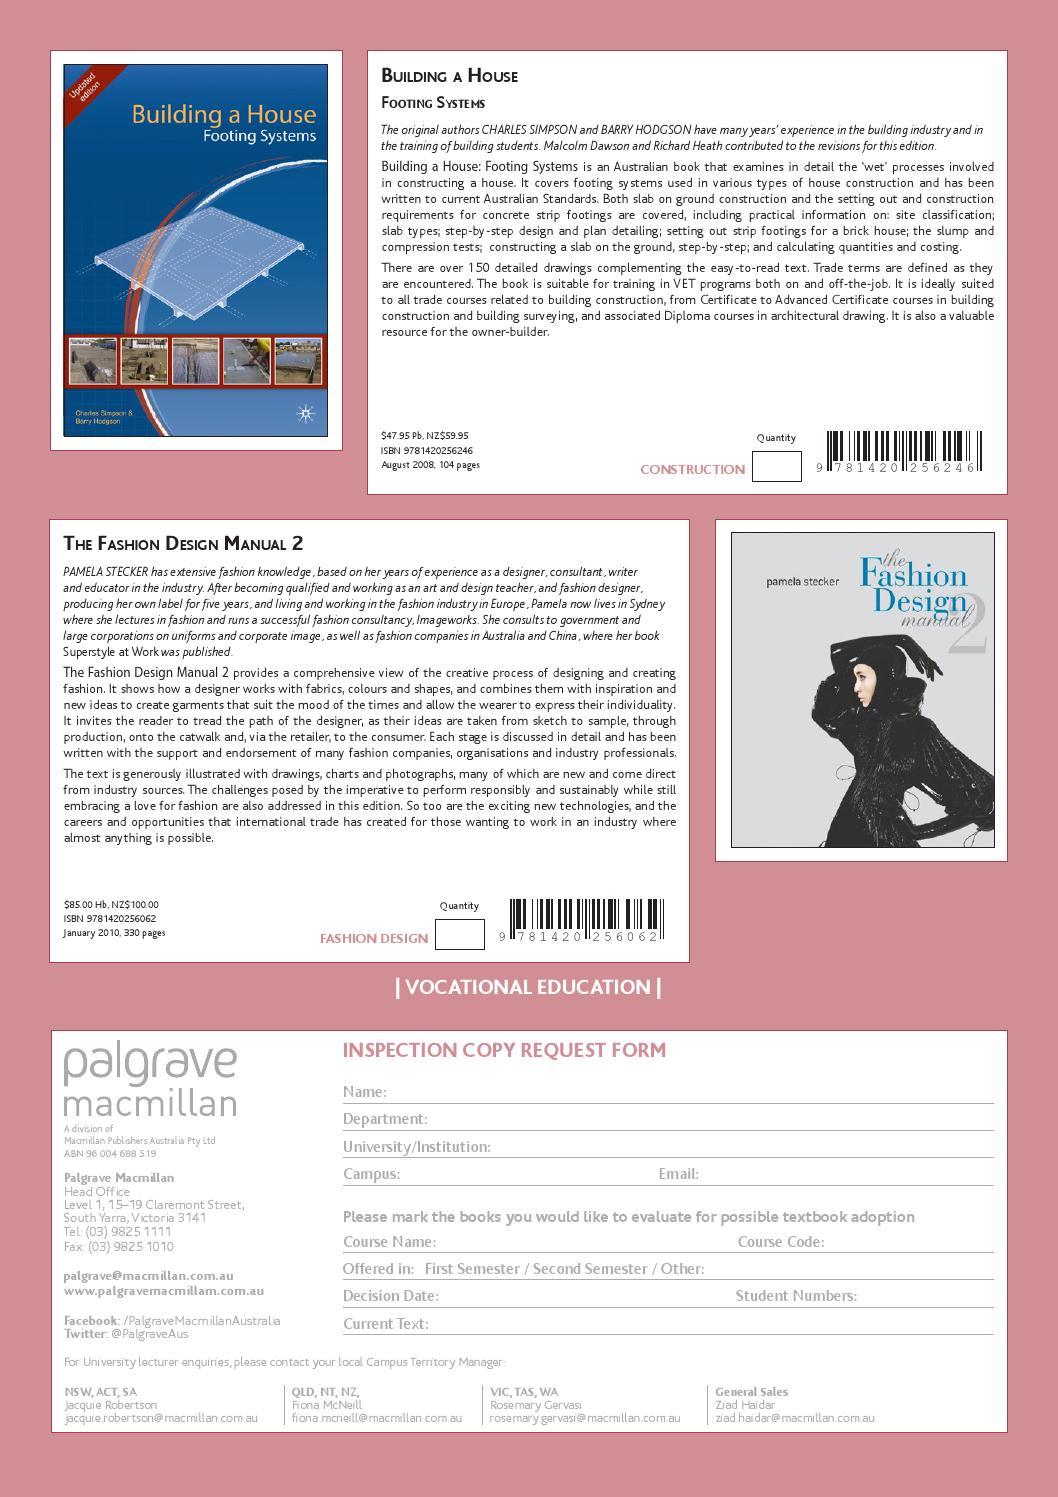 Palgrave Macmillan Australian Publishing Complete Catalogue 2014 By Palgrave Macmillan Australia Issuu